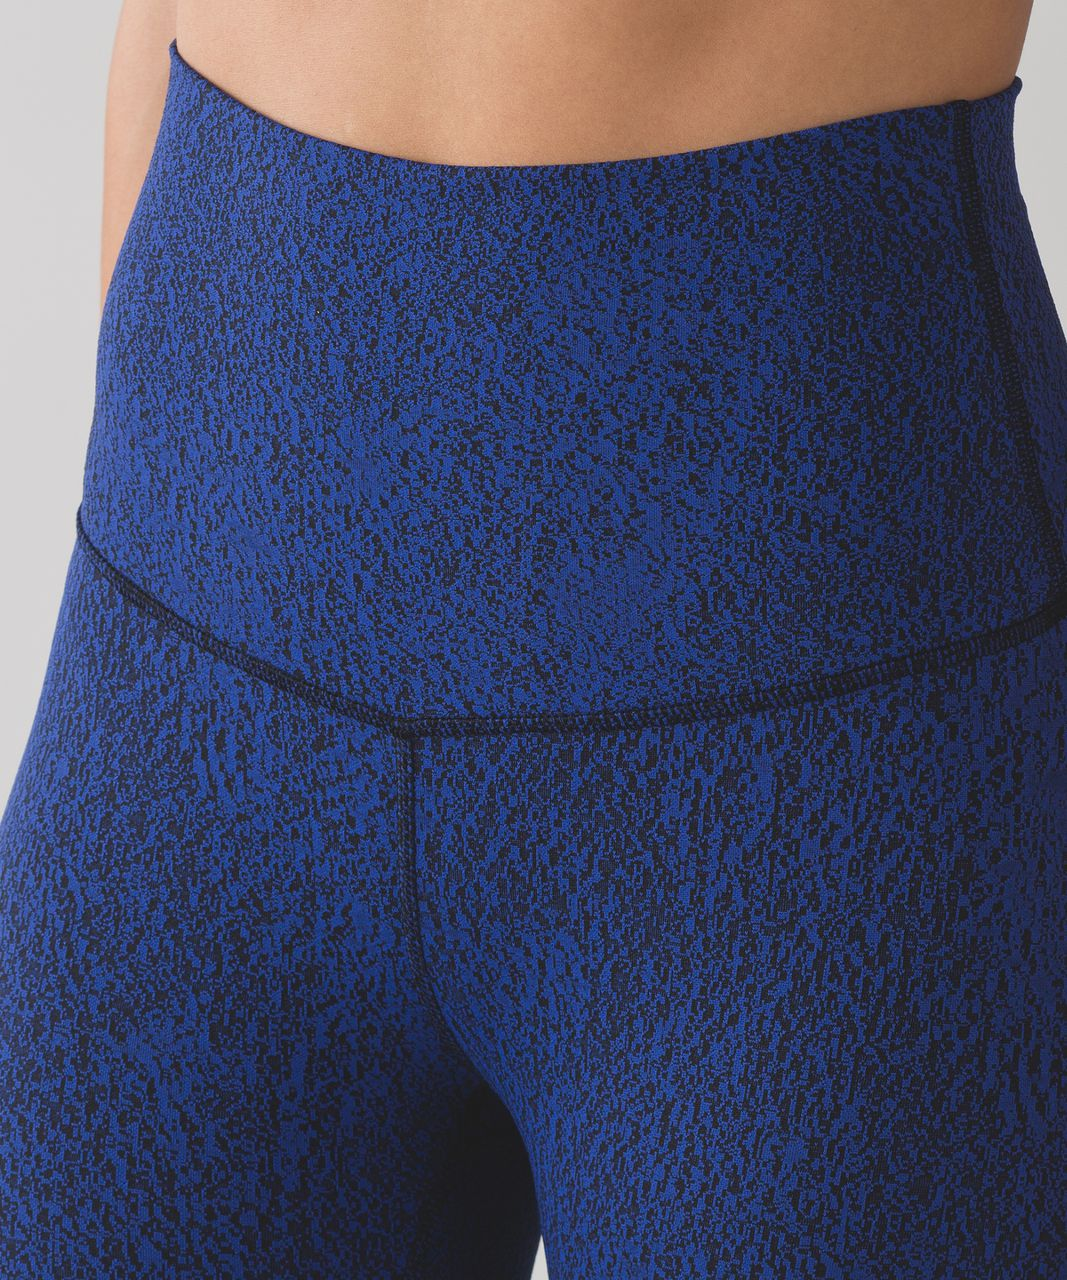 Lululemon Wunder Under Pant (Hi-Rise) - Power Luxtreme Spray Jacquard Sapphire Blue Black